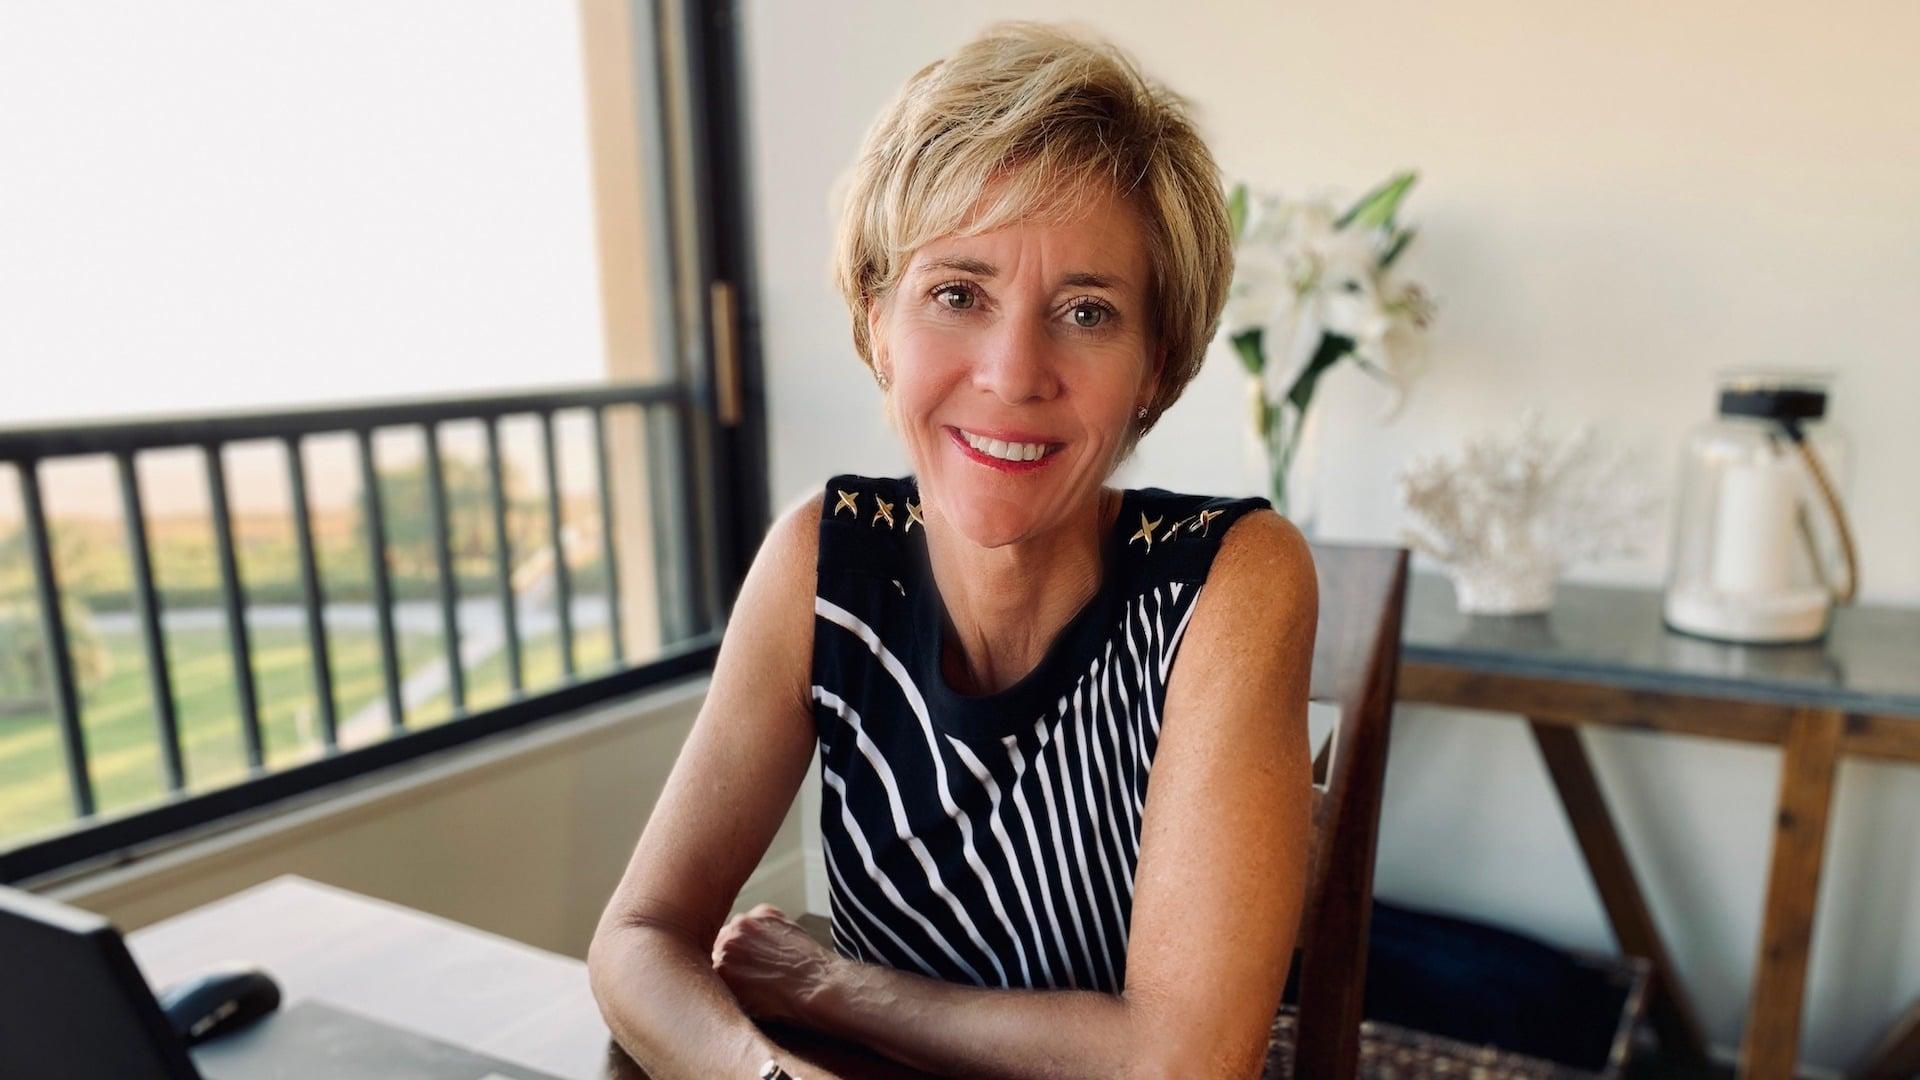 Michele Muir